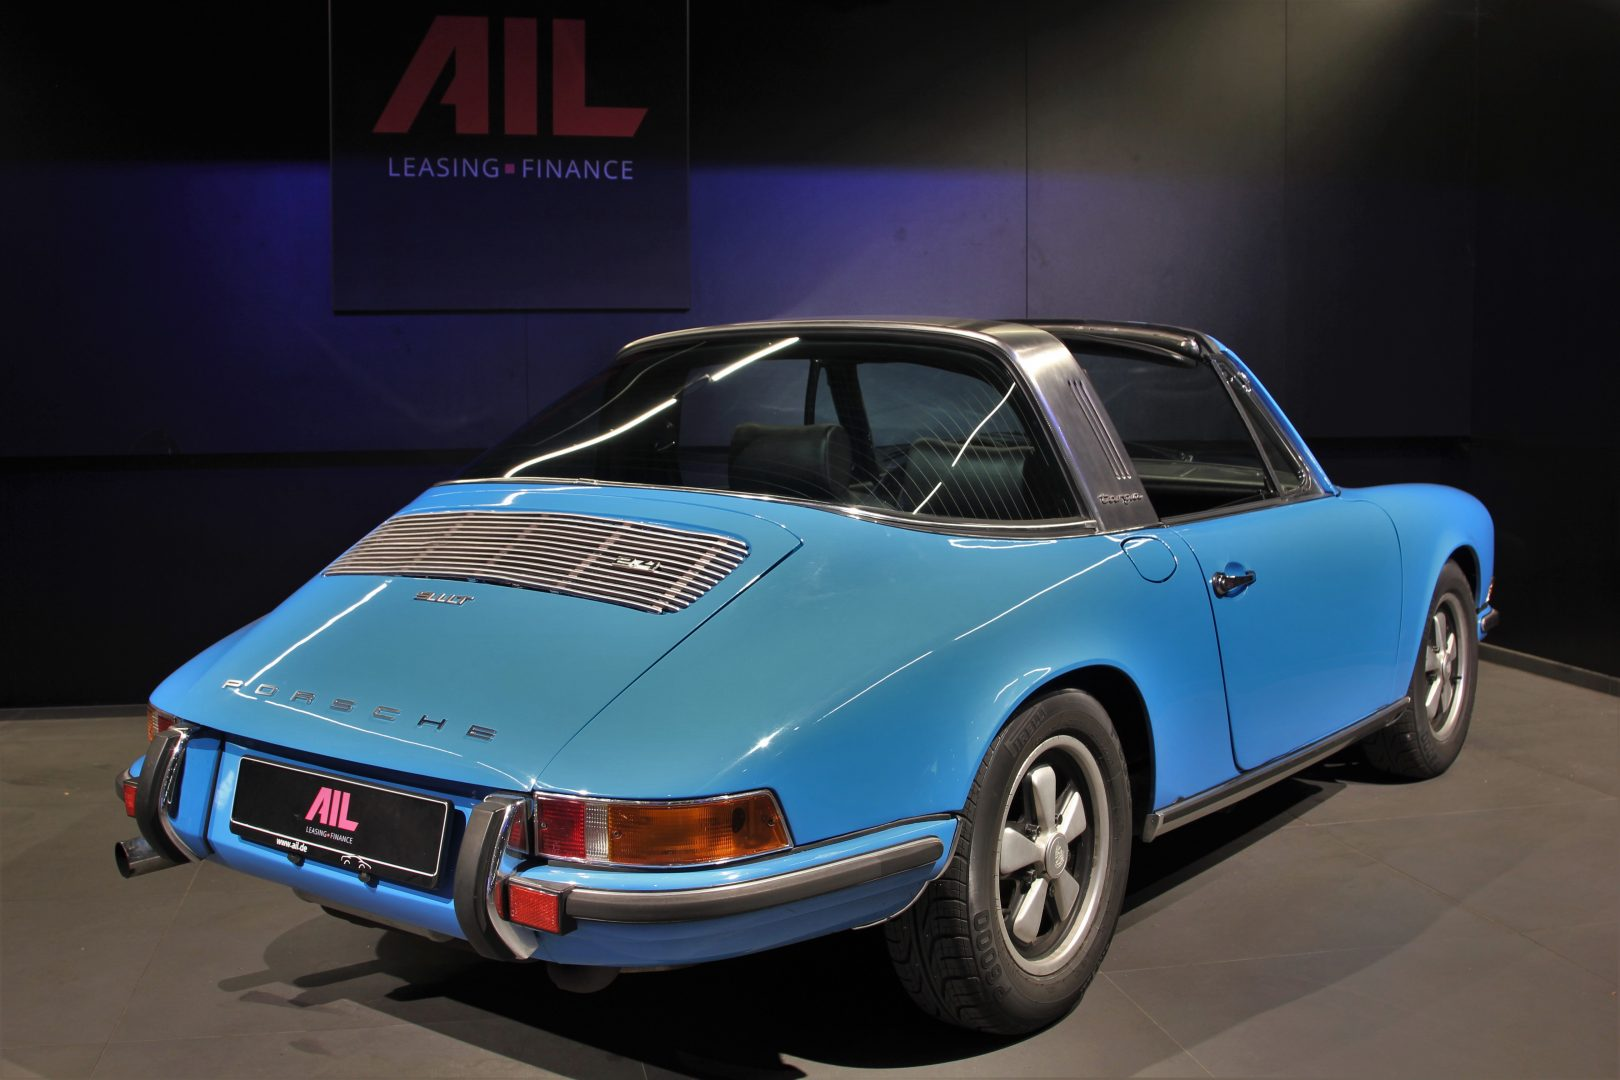 AIL Porsche 911 T Oelklappe  4